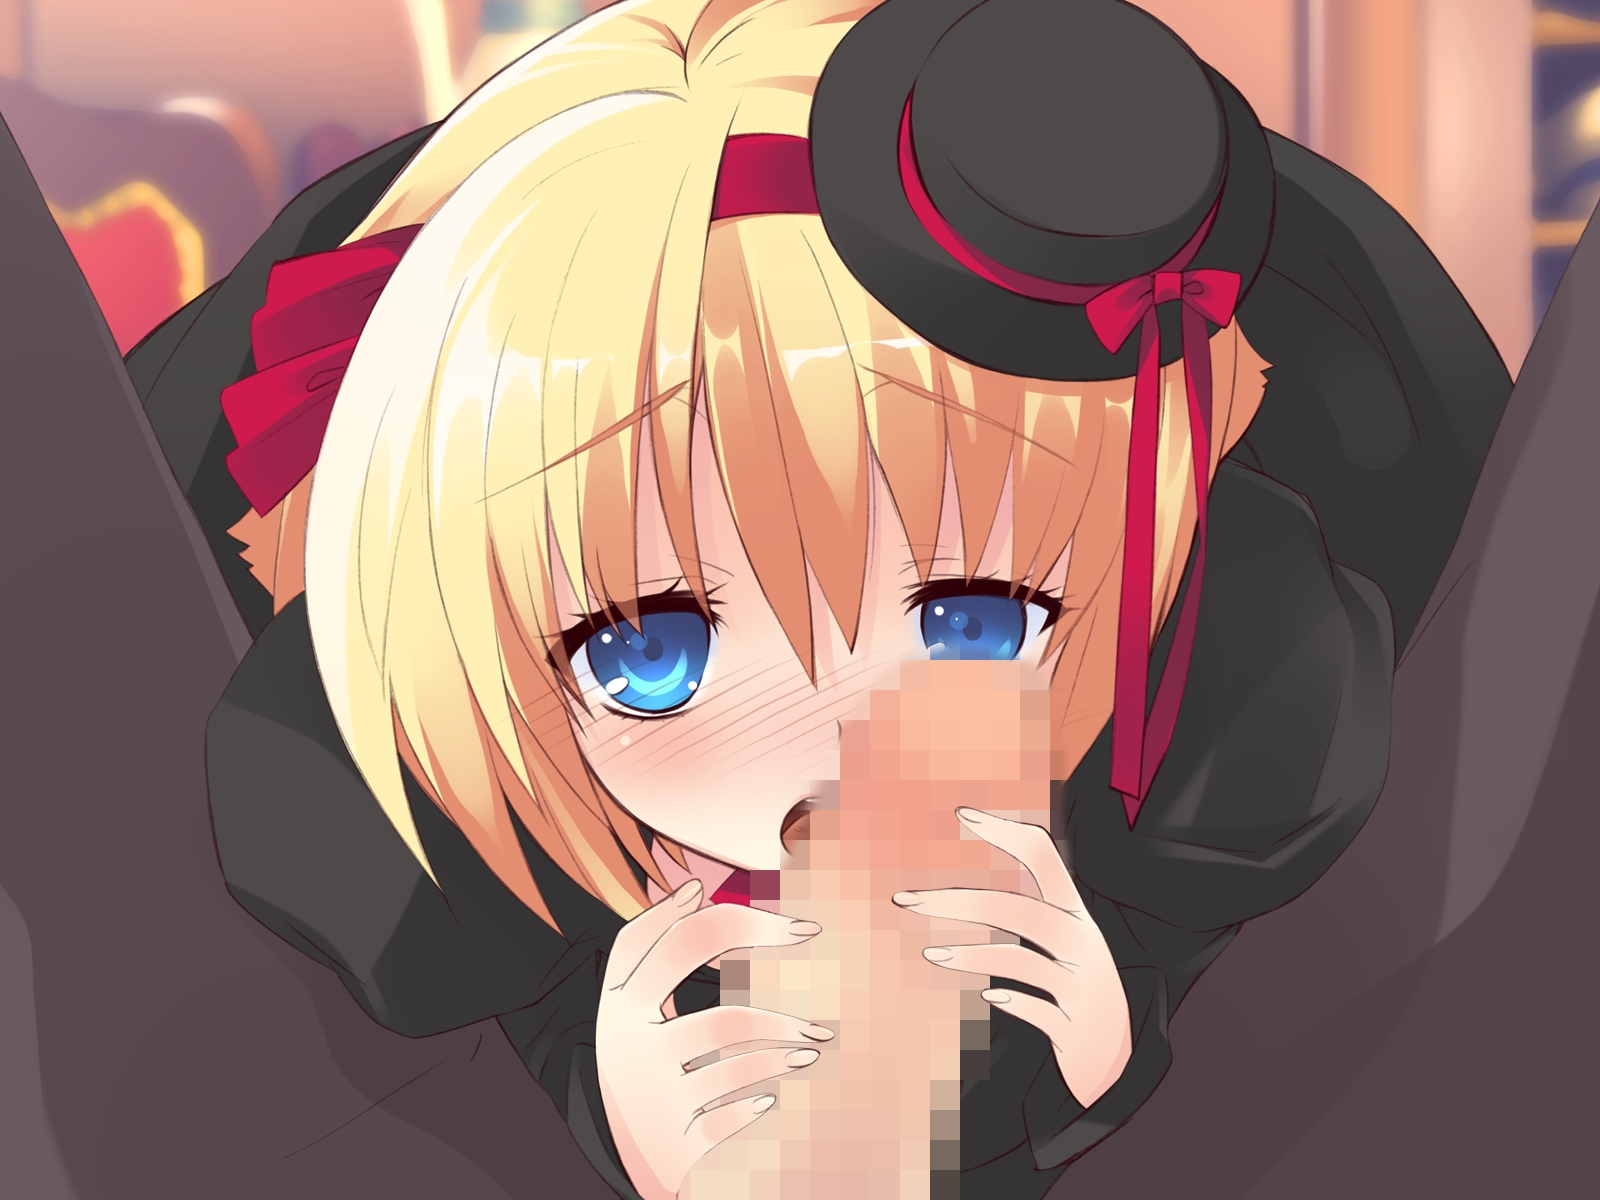 alice_parade blonde_hair blue_eyes censored game_cg odoodo_funny penis unisonshift